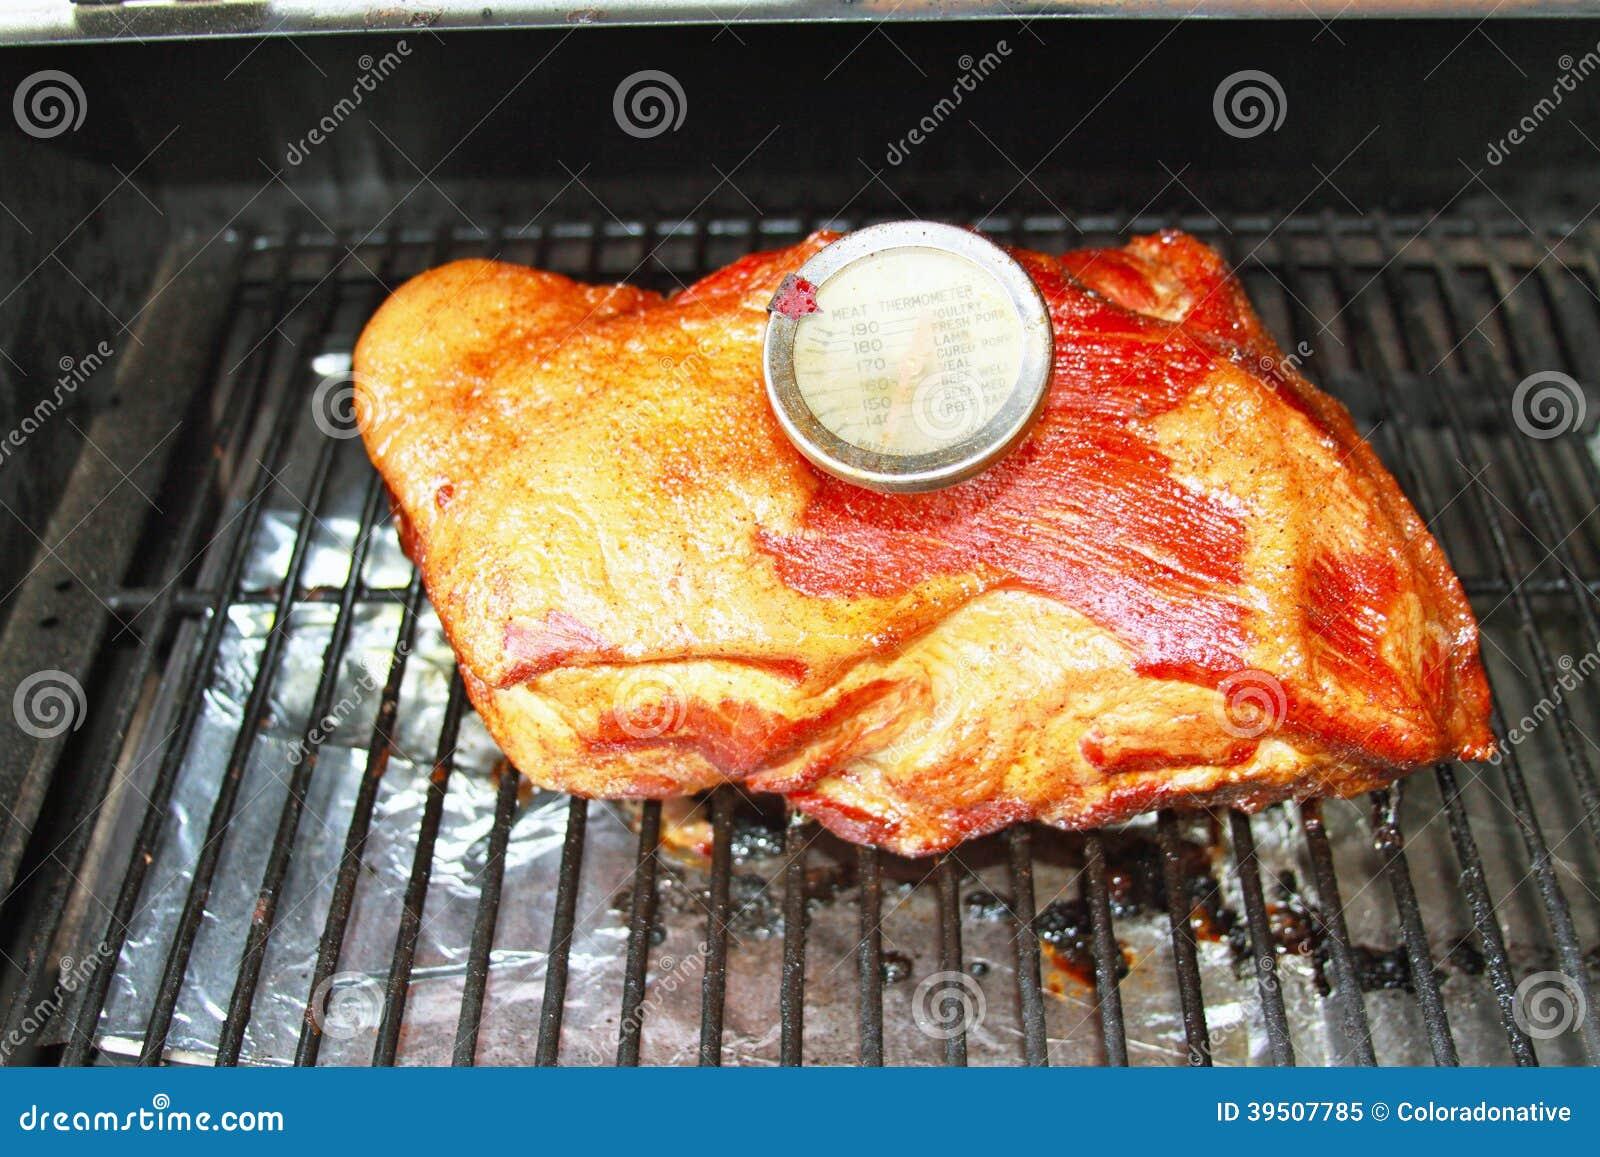 Pork Roast on Barbeque